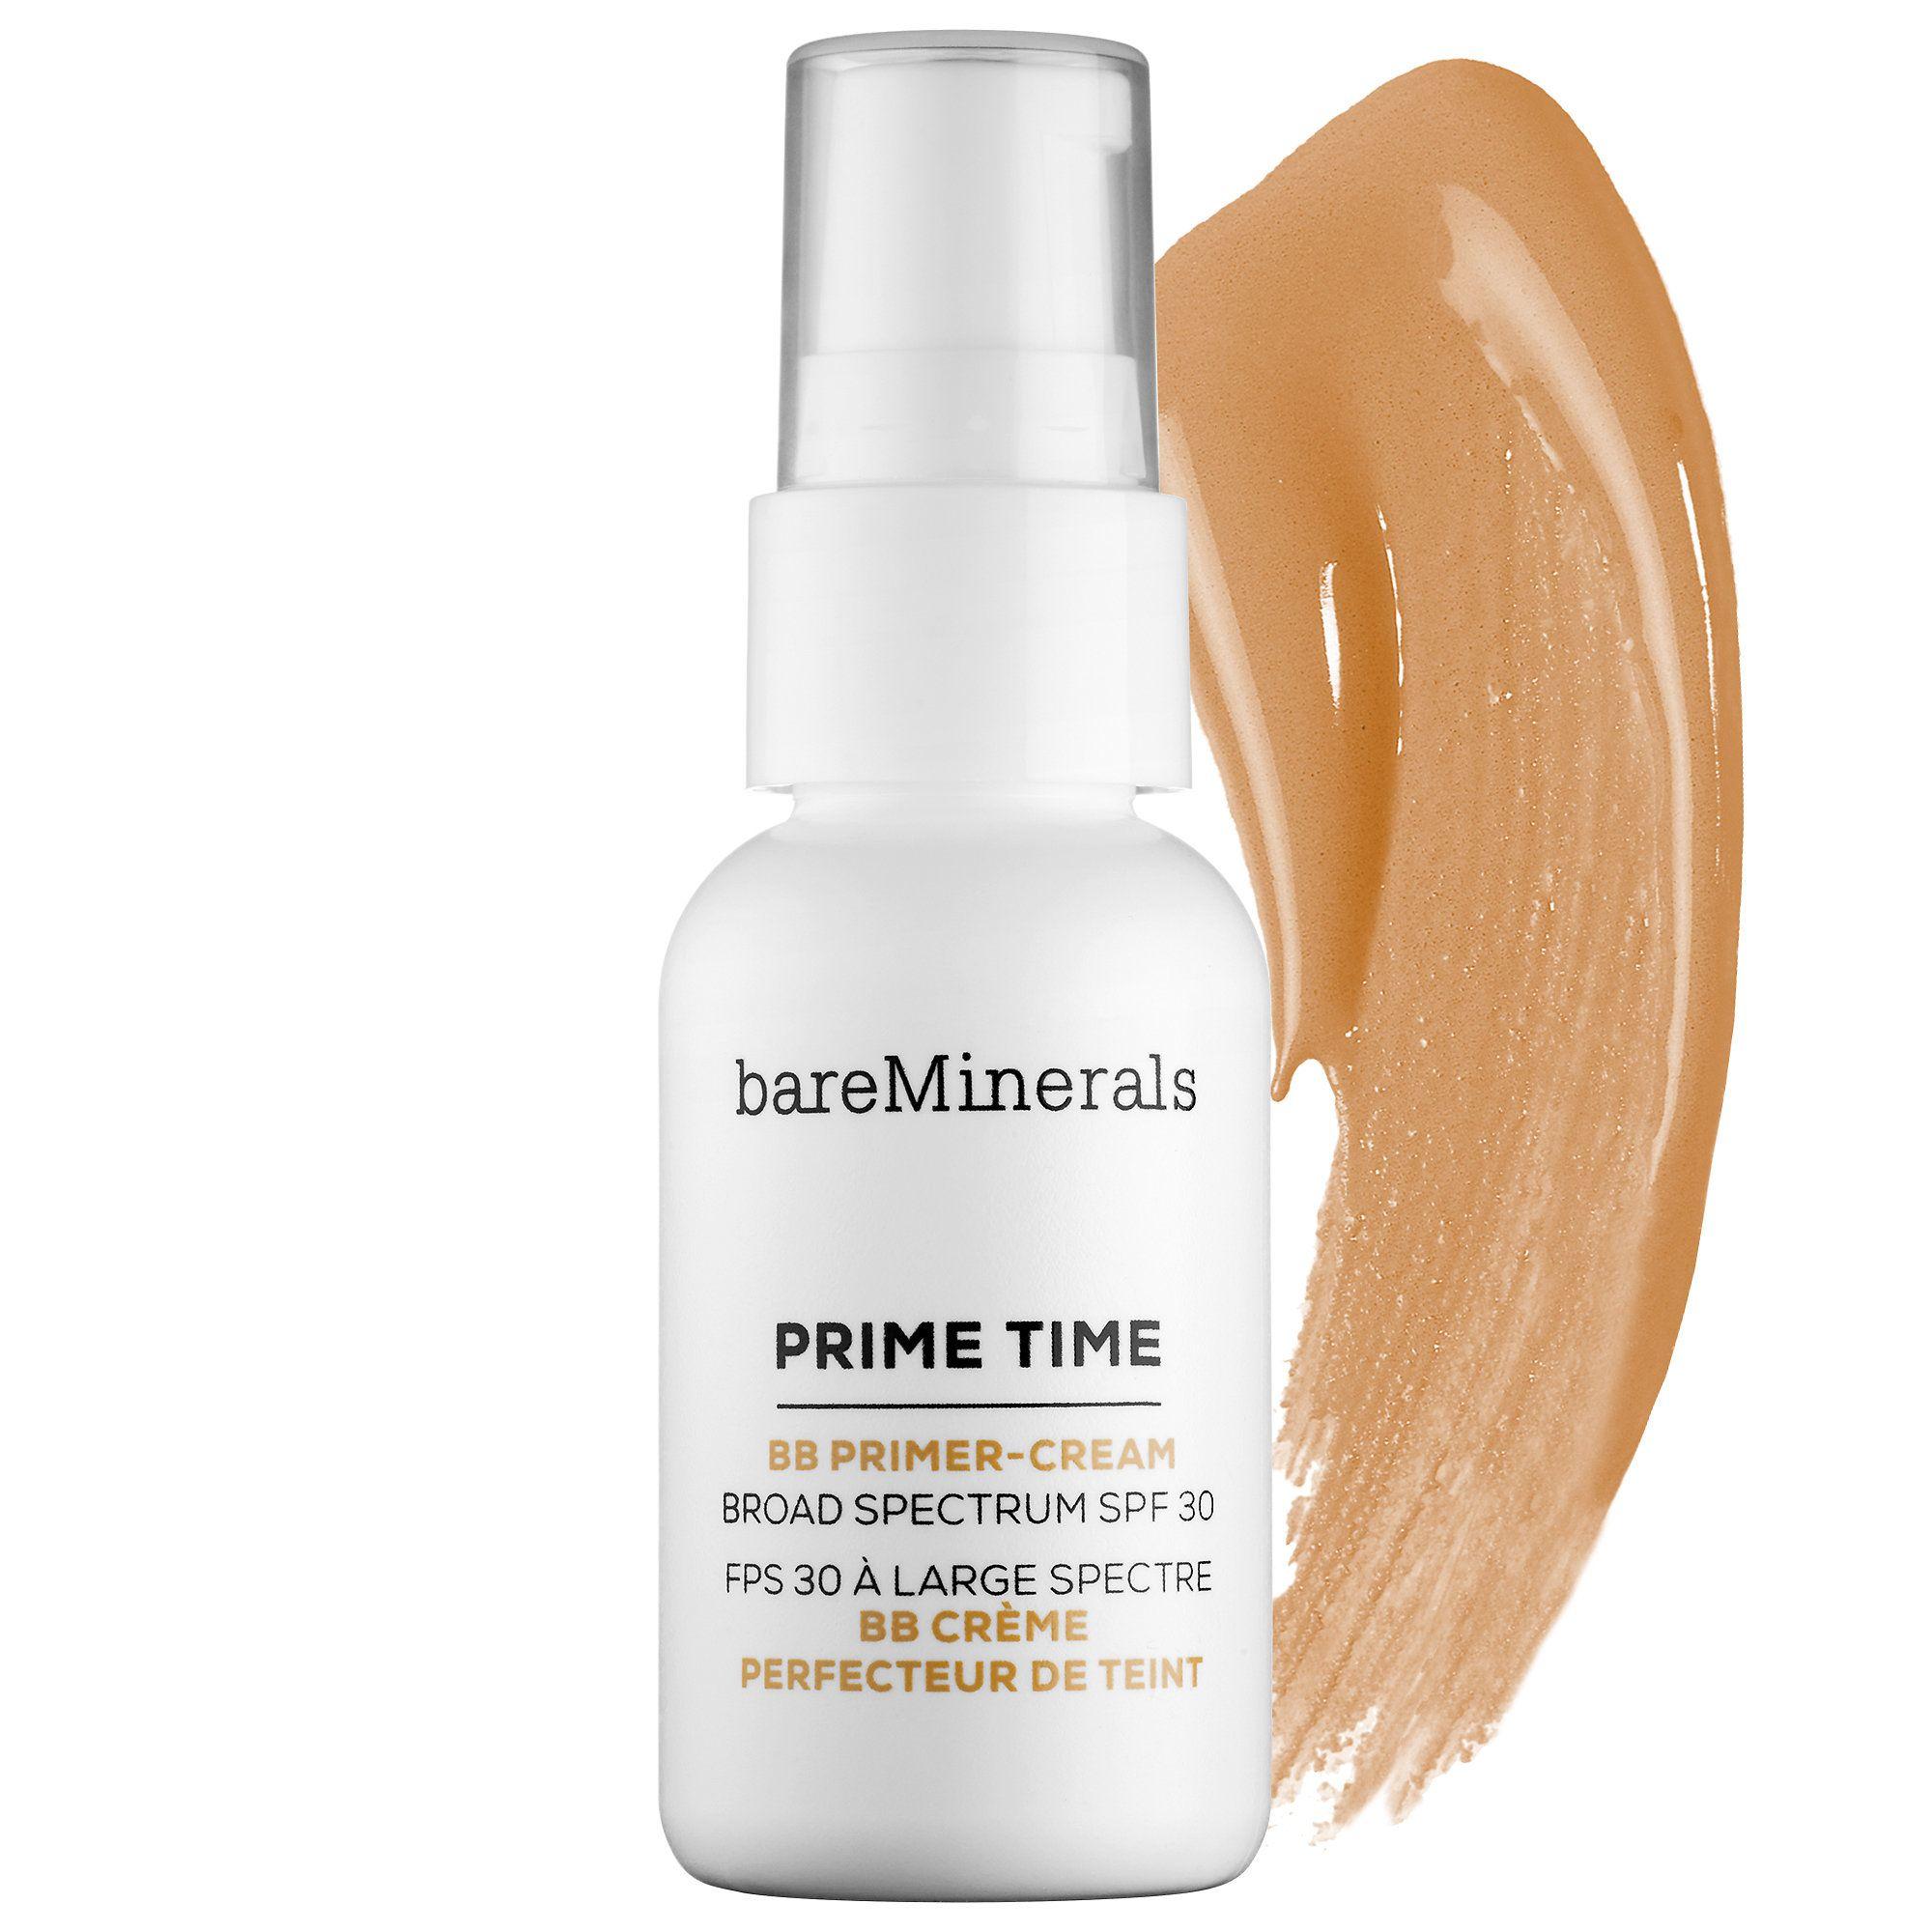 Prime Time BB PrimerCream Daily Defense Broad Spectrum